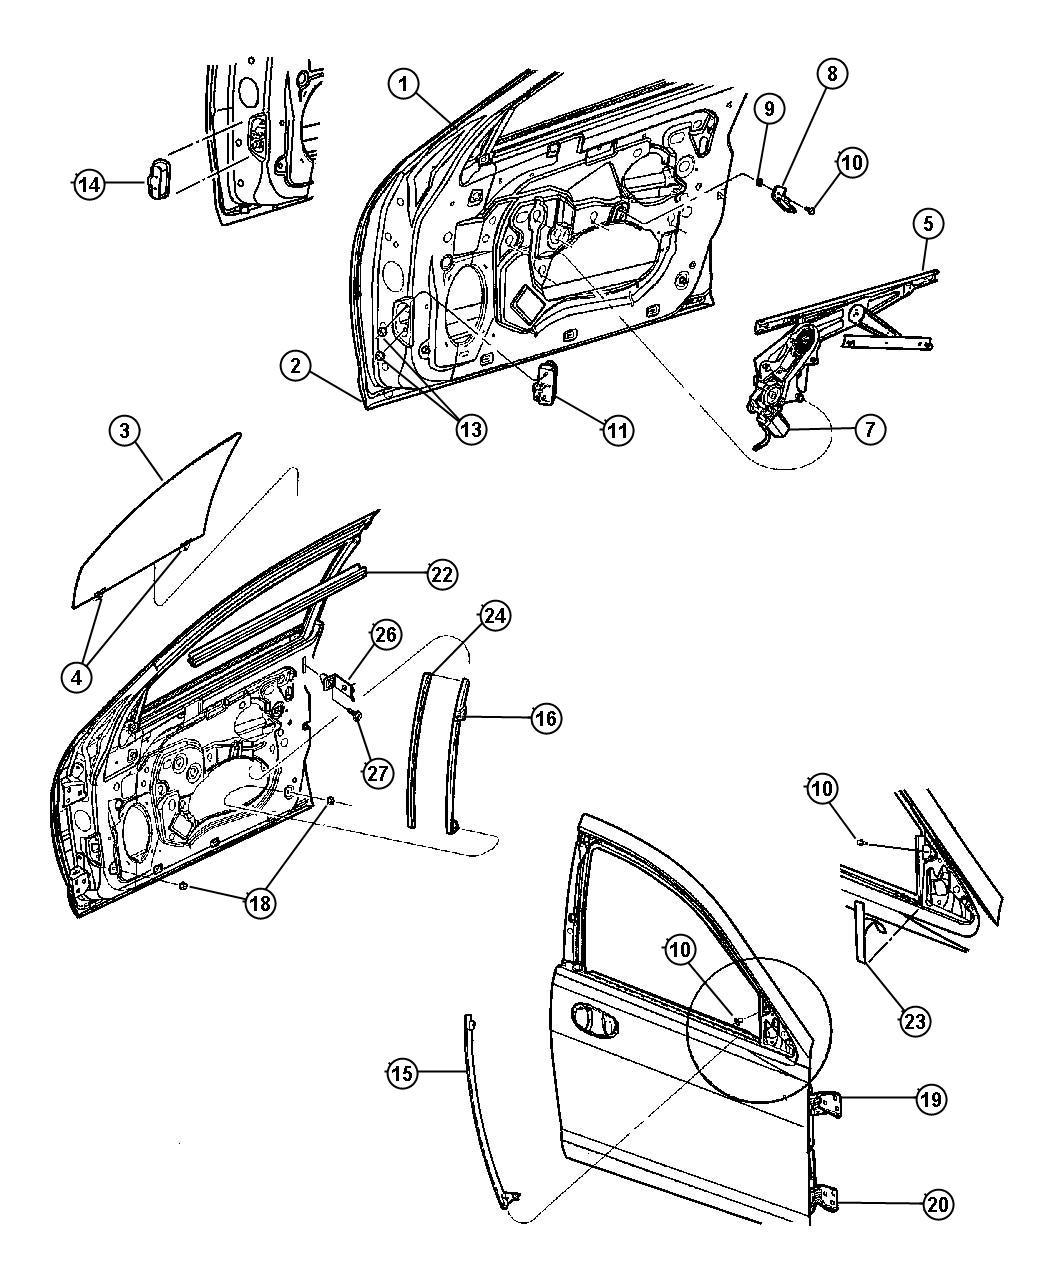 box diagram 2005 dodge stratus fuse box diagram chrysler pt cruiser